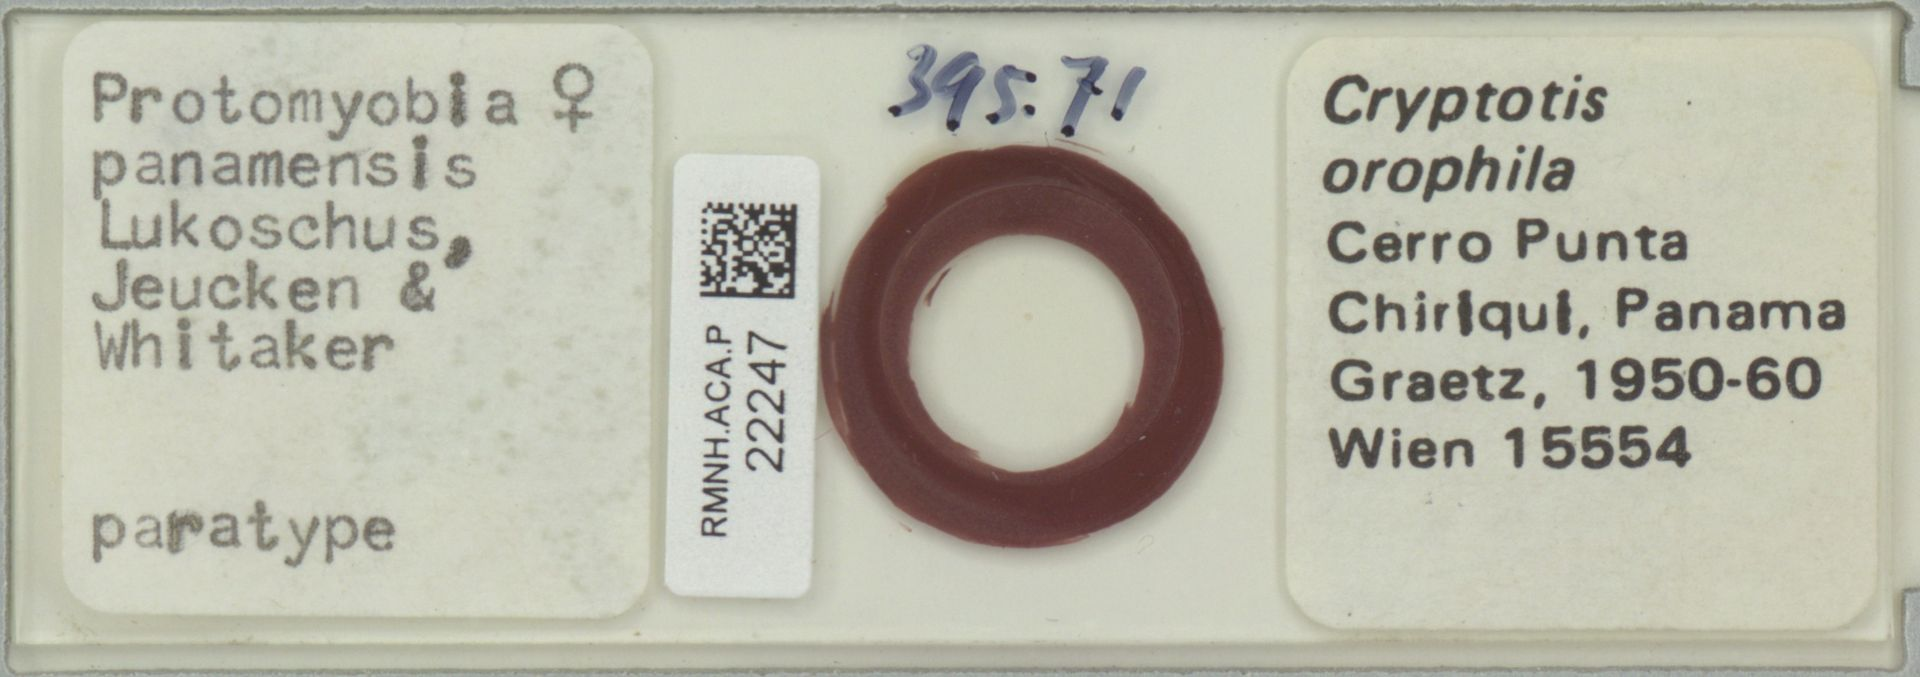 RMNH.ACA.P.22247 | Protomyobia panamensis Lukoschus, Jeucken & Whitaker